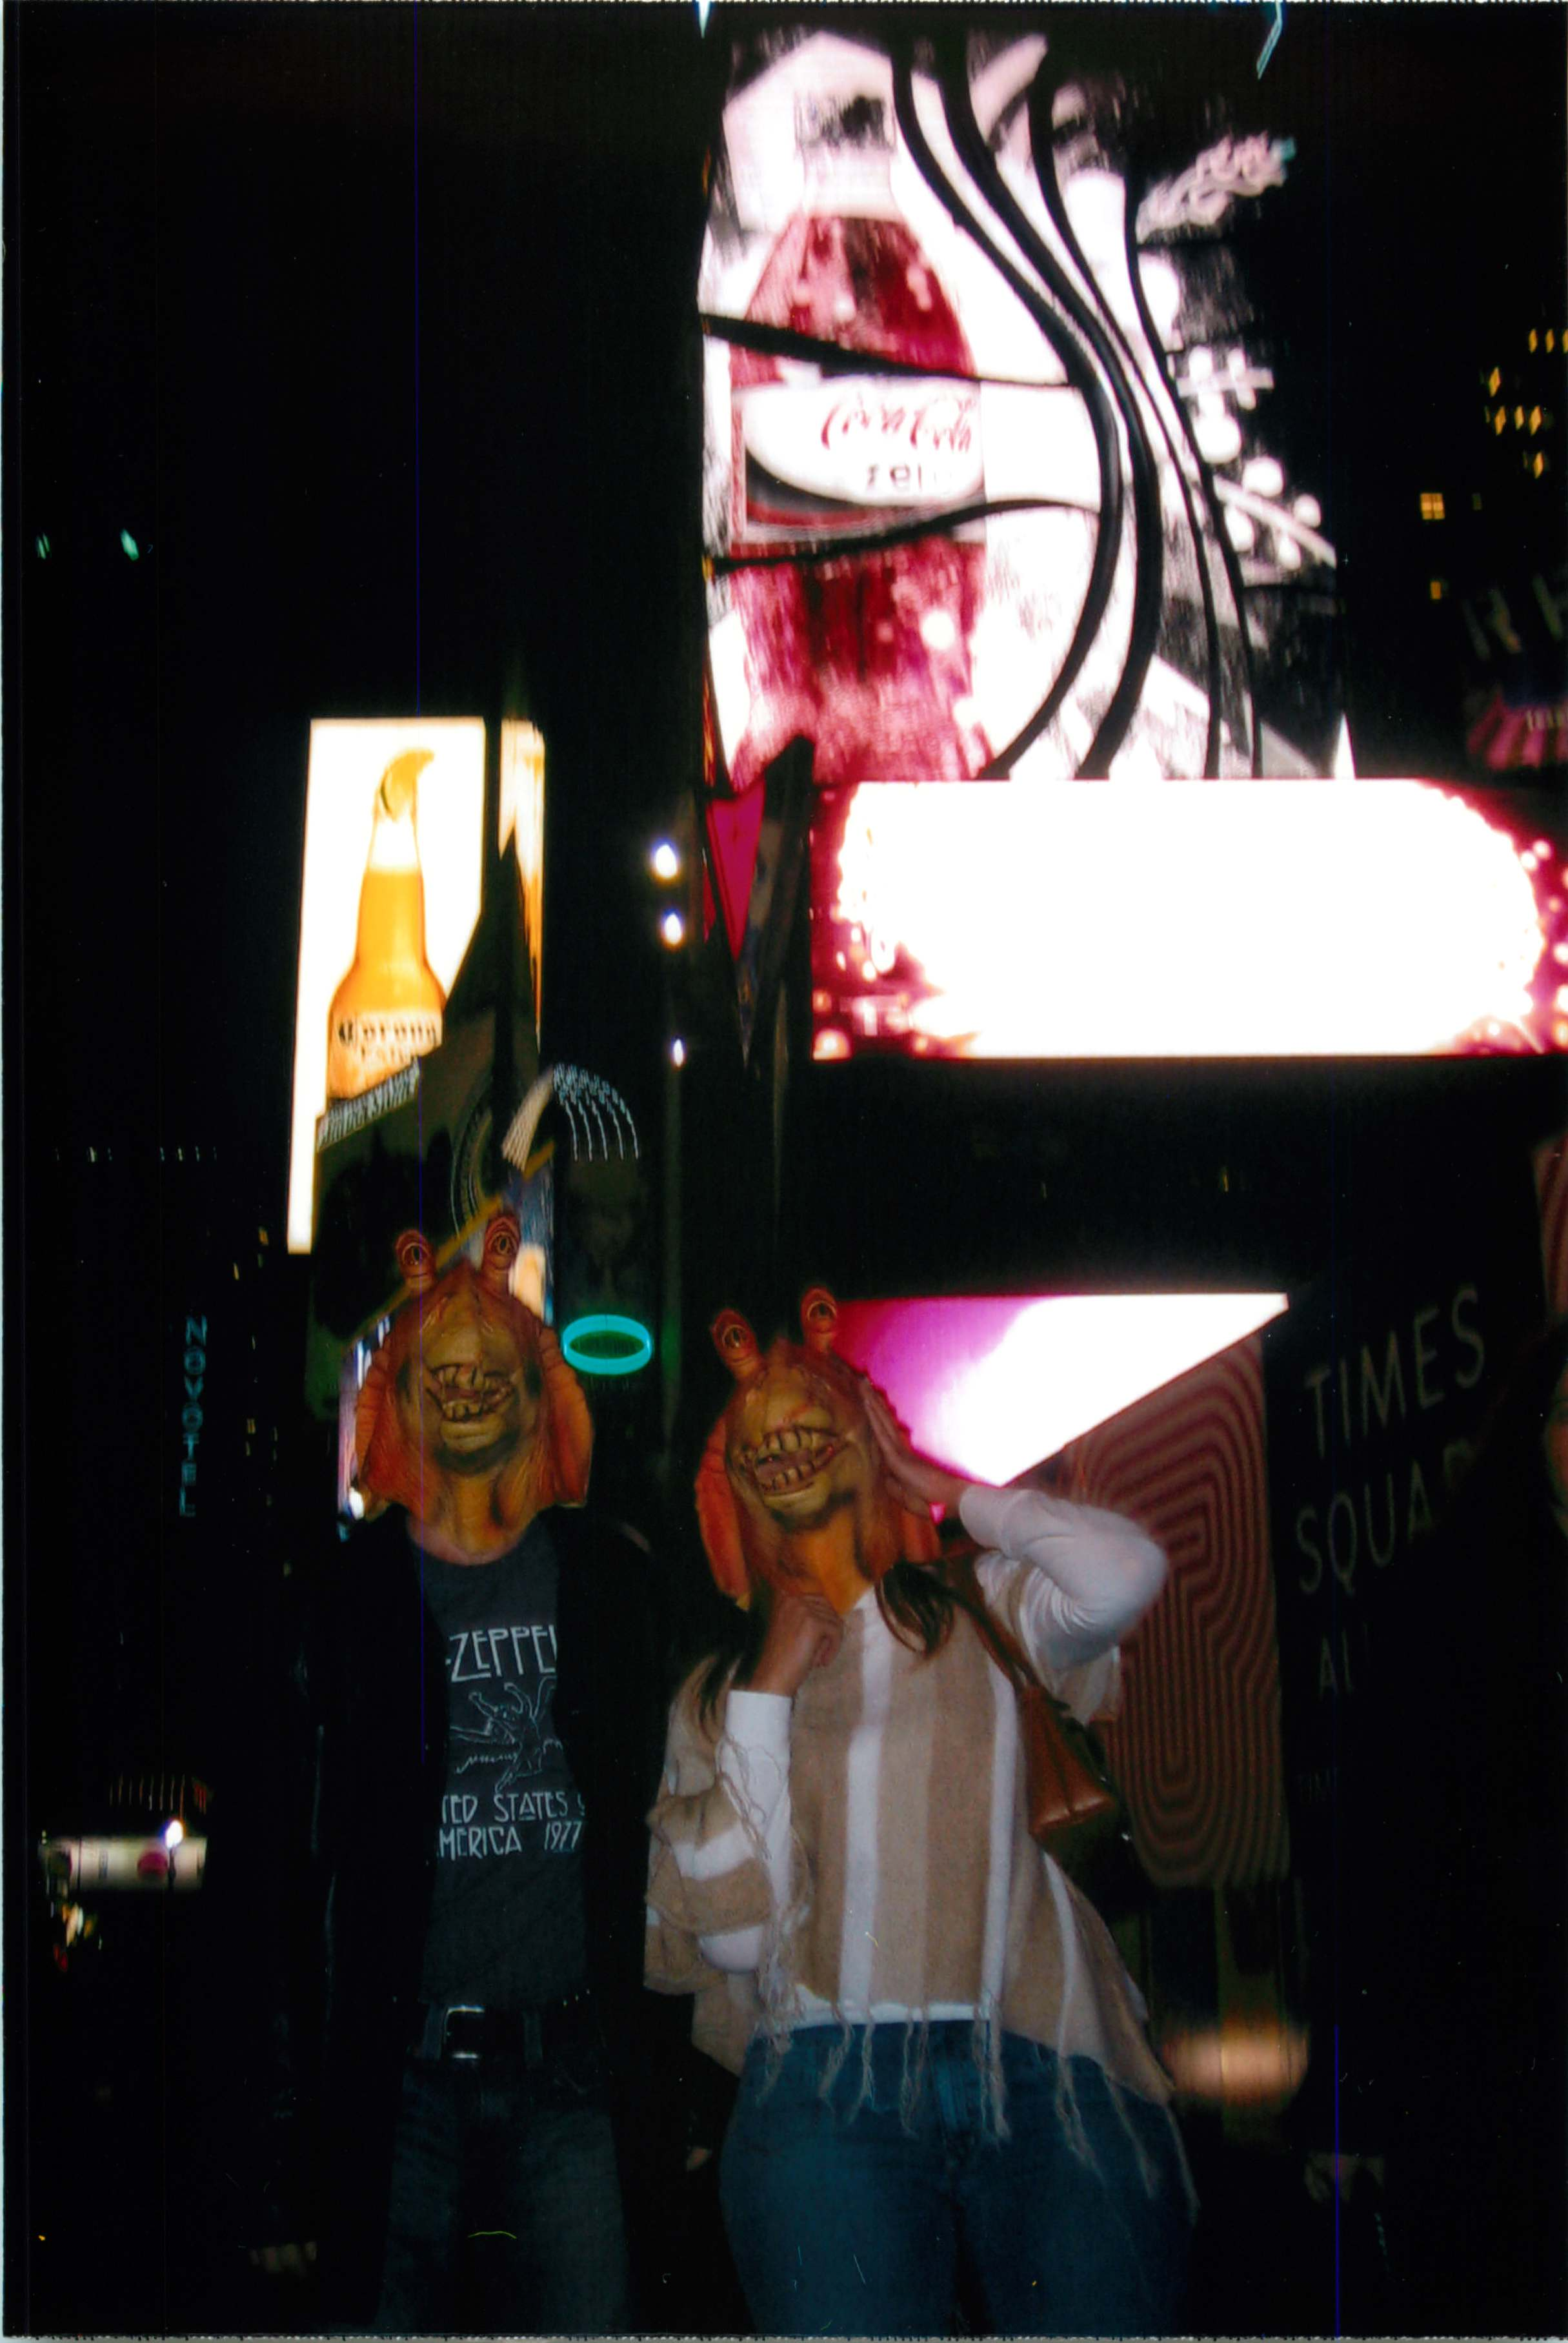 Times Square, NY 2 copy.jpg